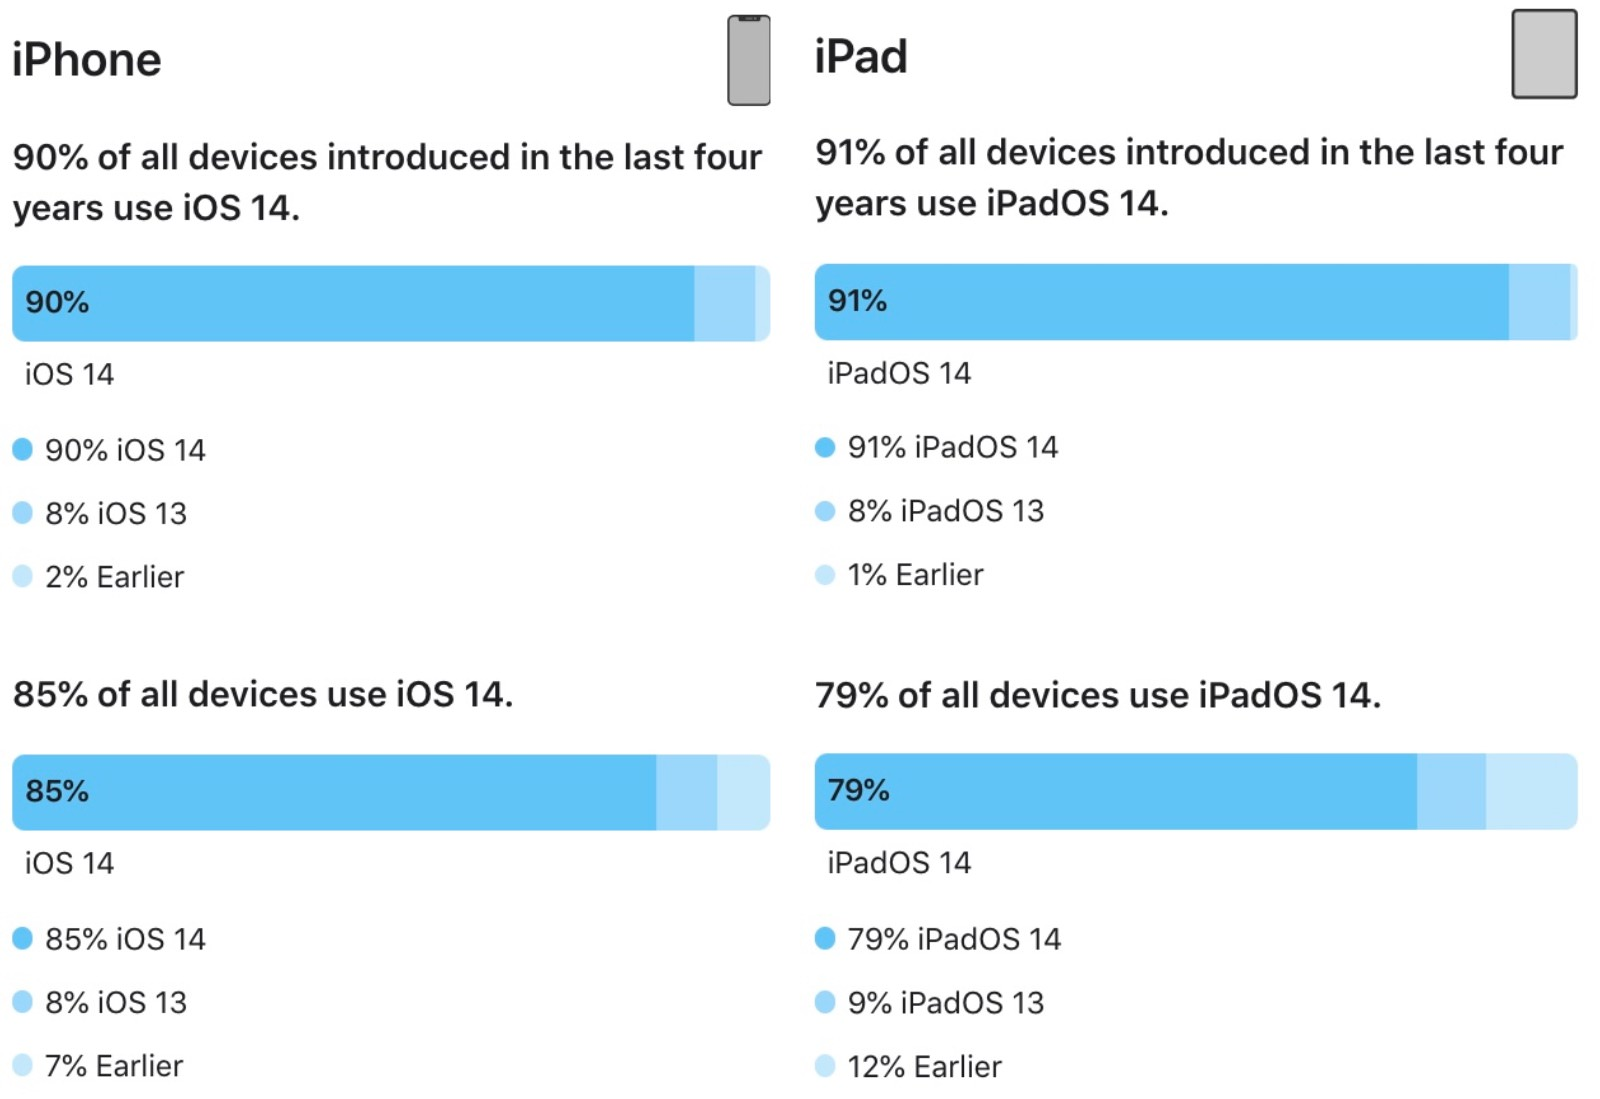 IOS iPadOS 14 share